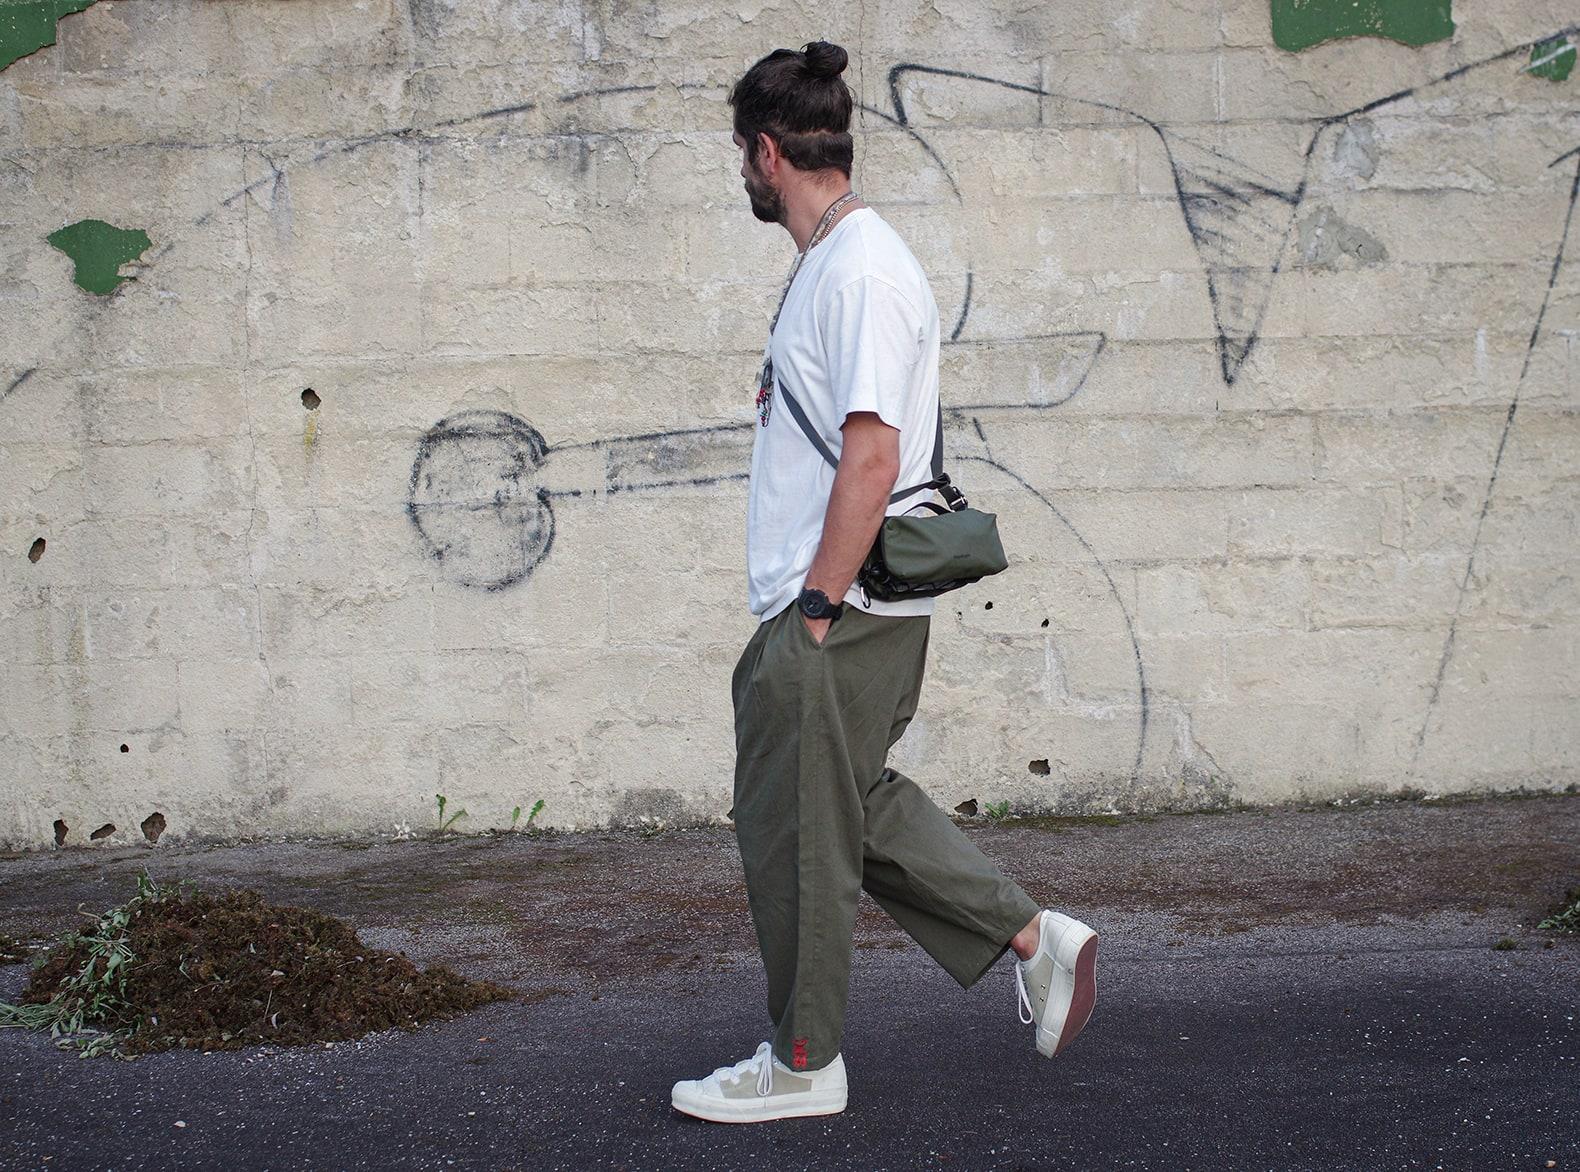 pantalon ample bggy sillage avec sac topologie brick pouch